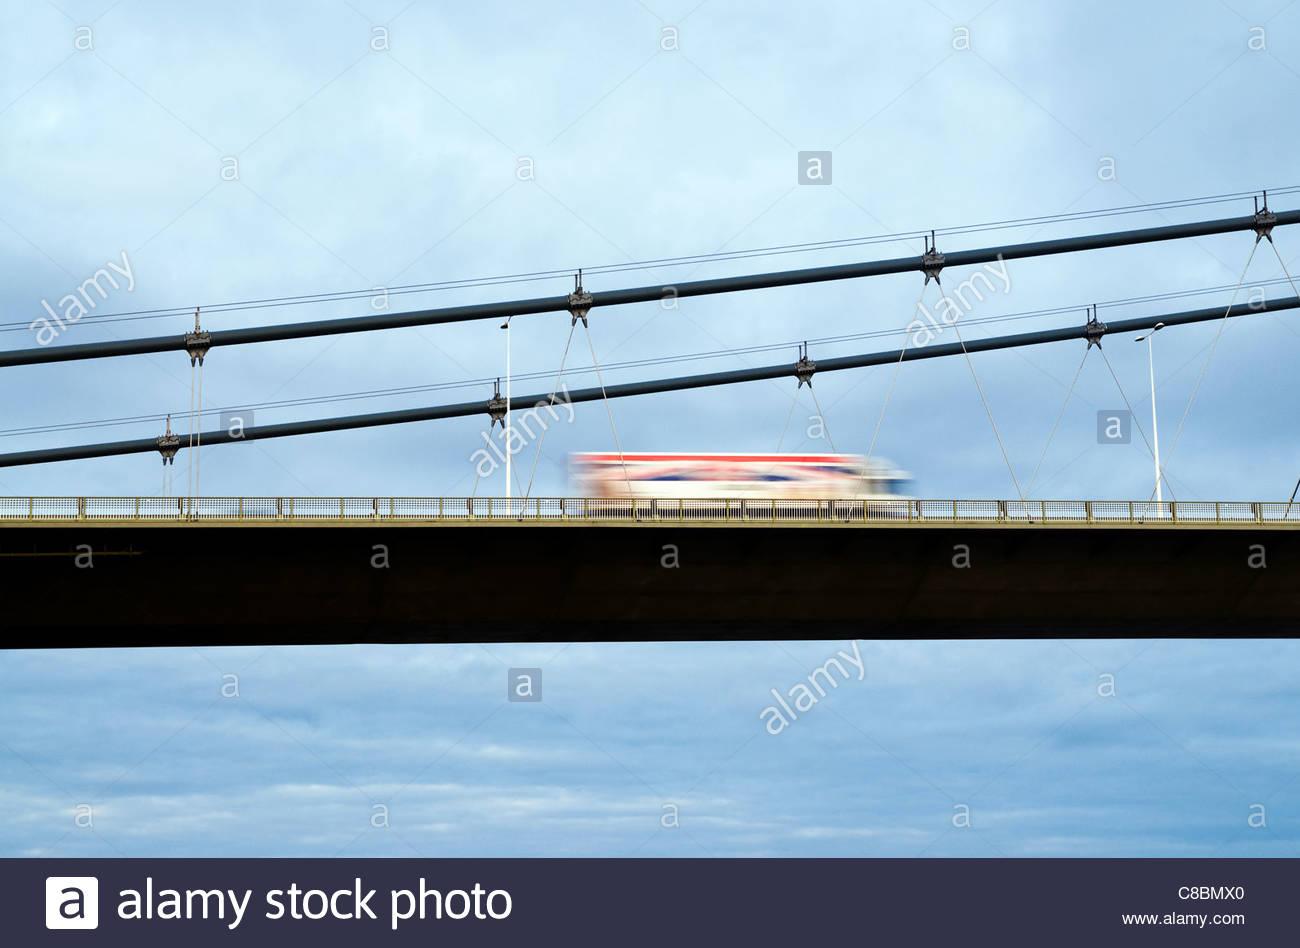 truck on bridge - Stock Image